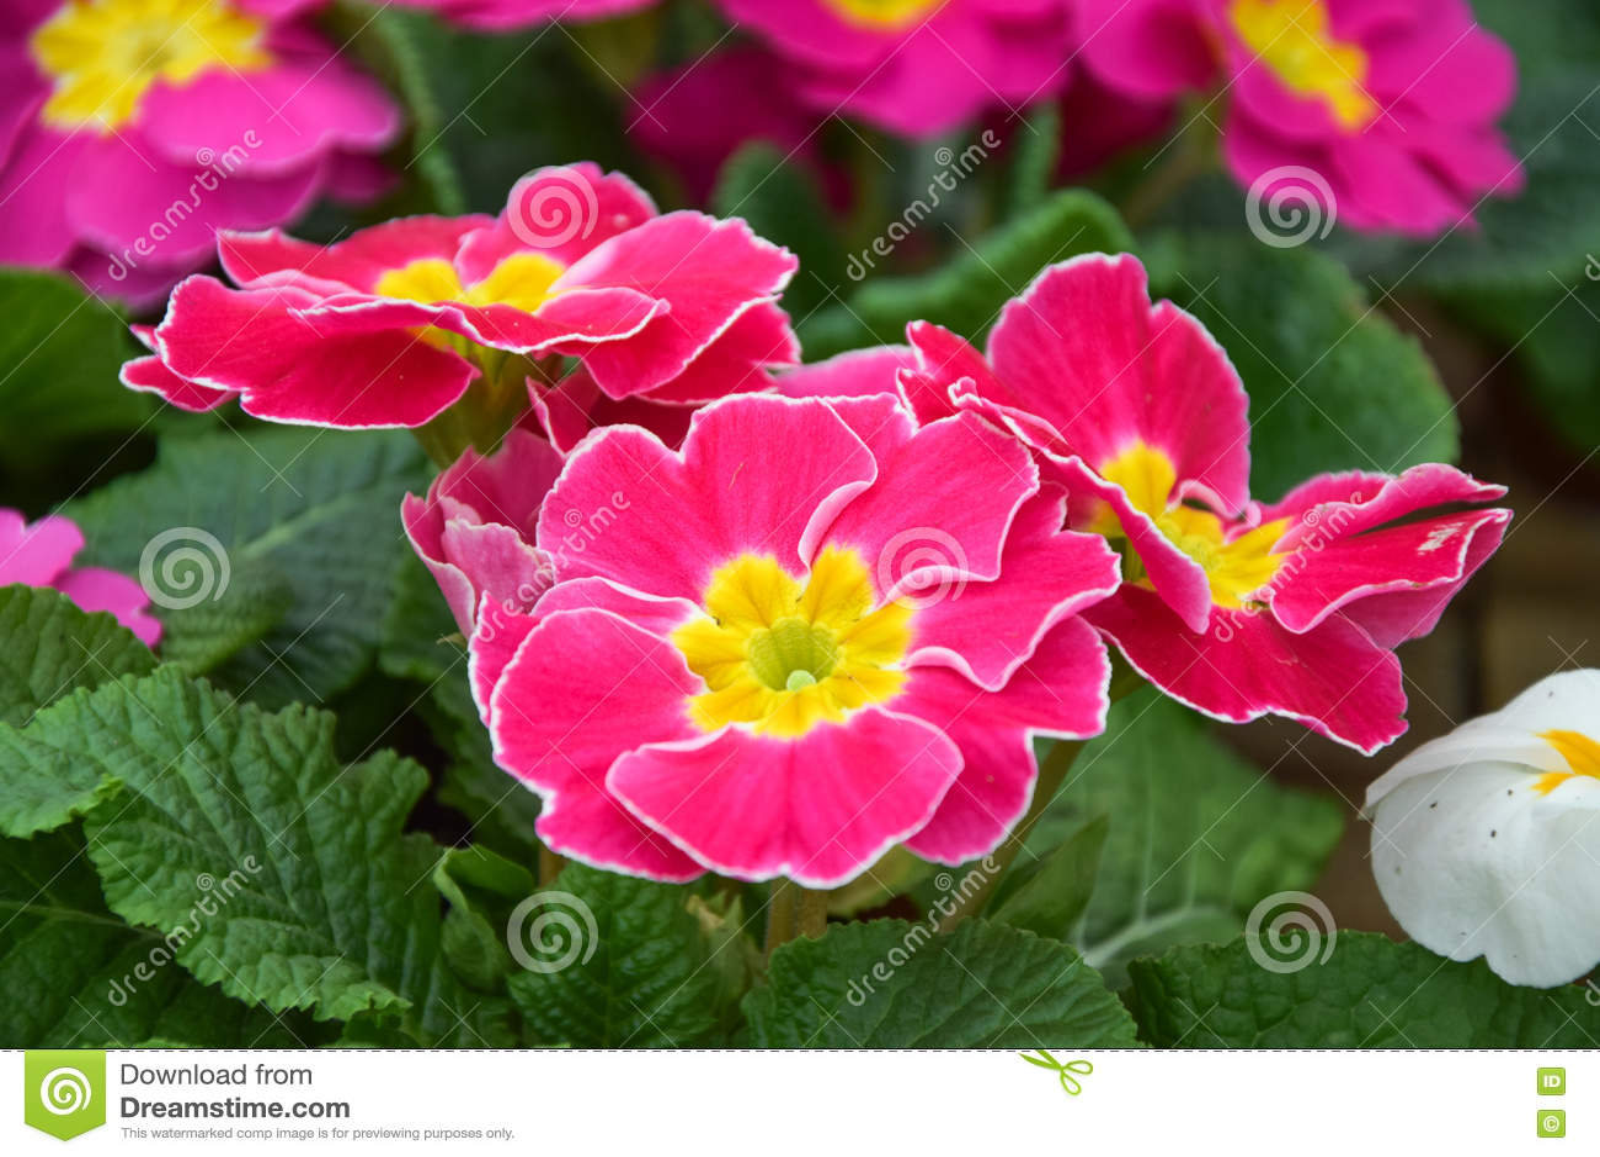 Pink Primrose Flower Primula Cultivar Stock Photo Image Of Image